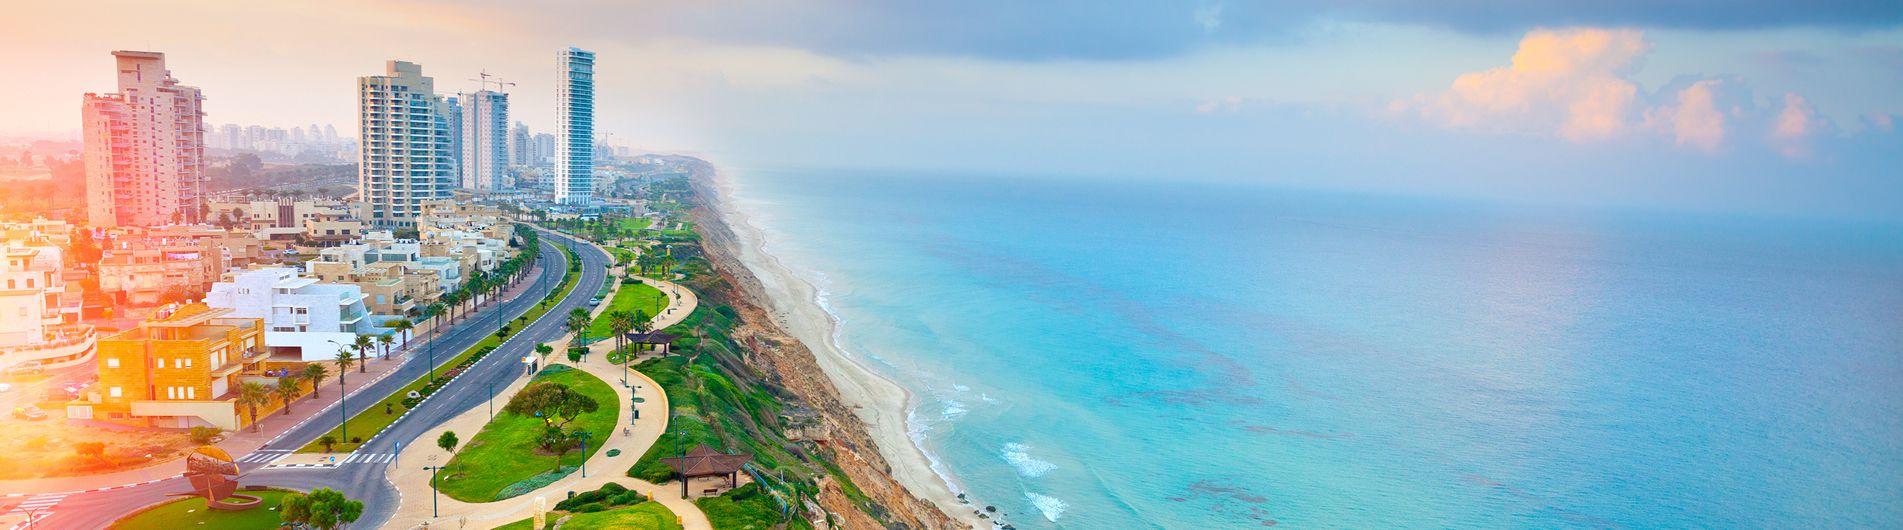 City Break Holidays in Israel